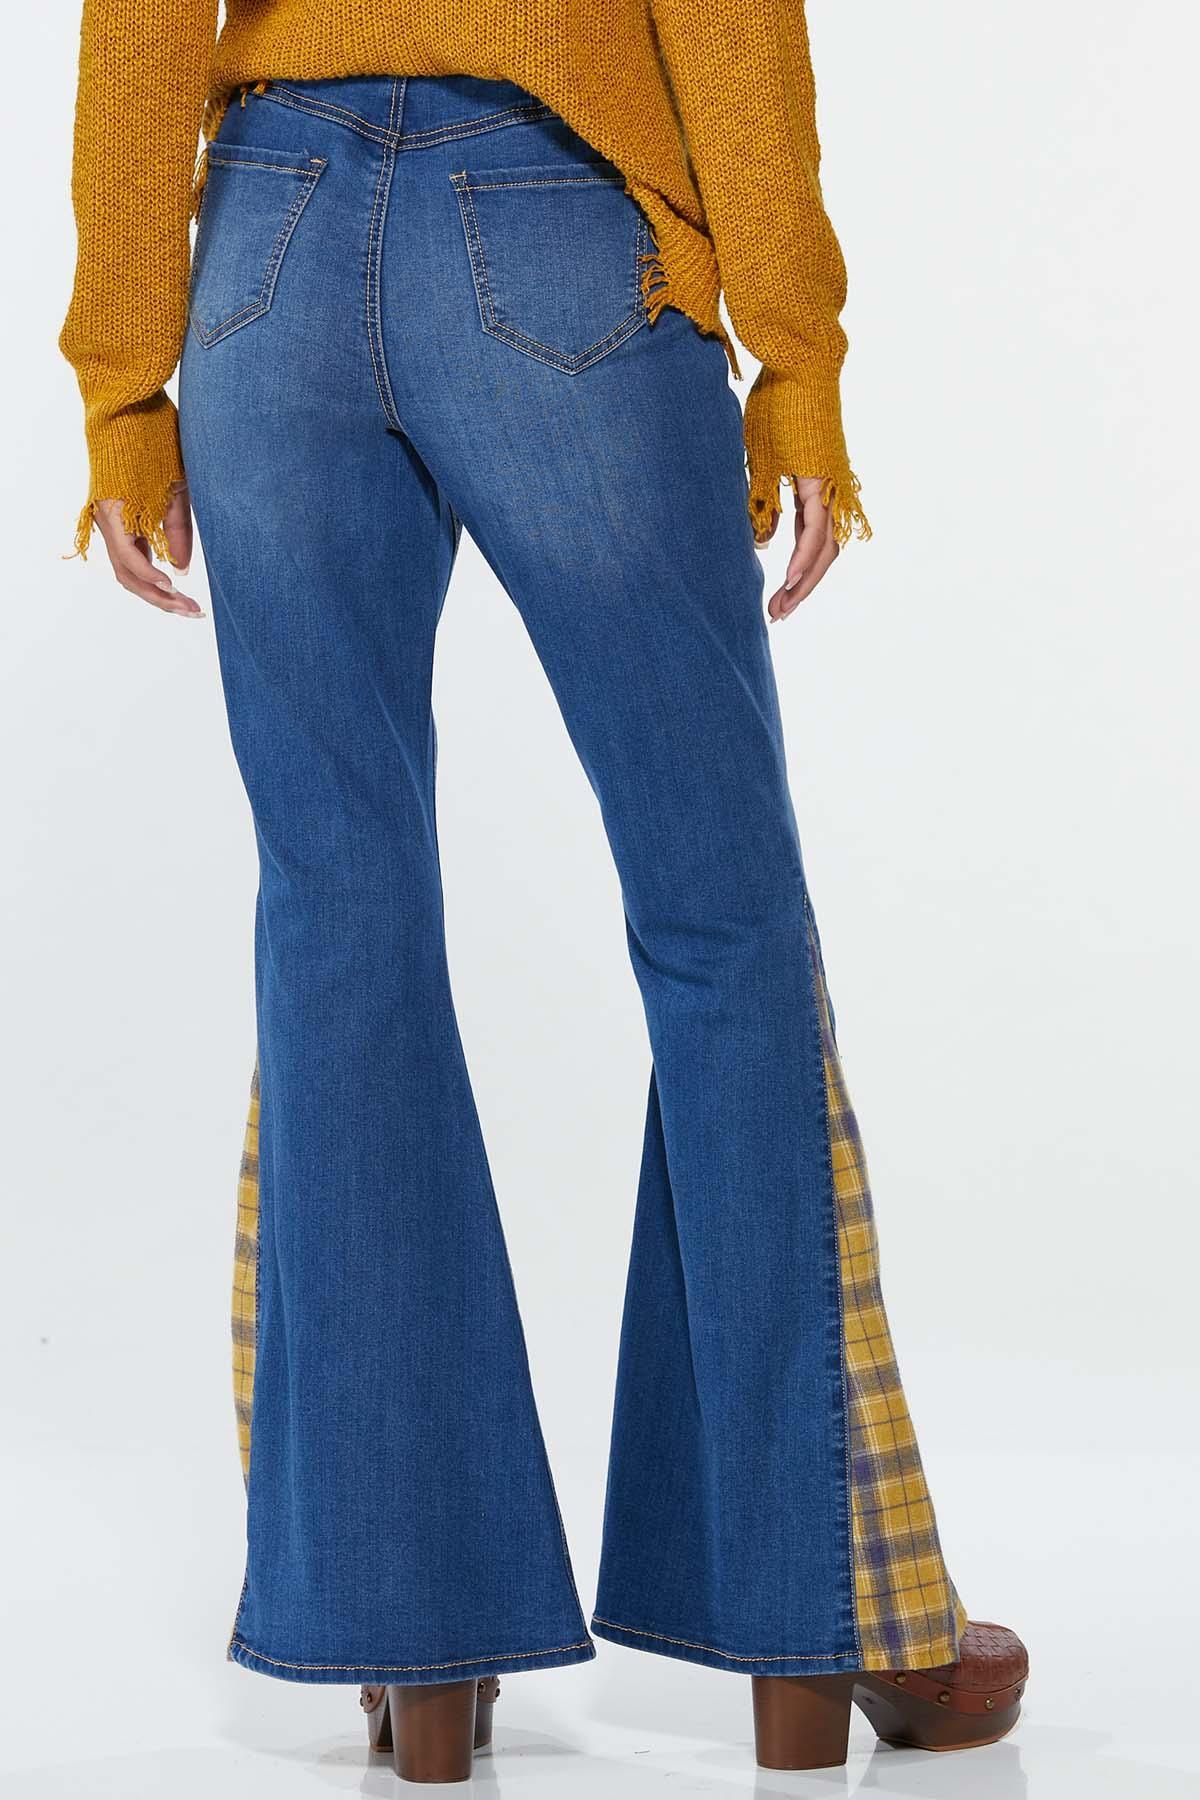 Petite Plaid Inset Flare Jeans (Item #44702833)